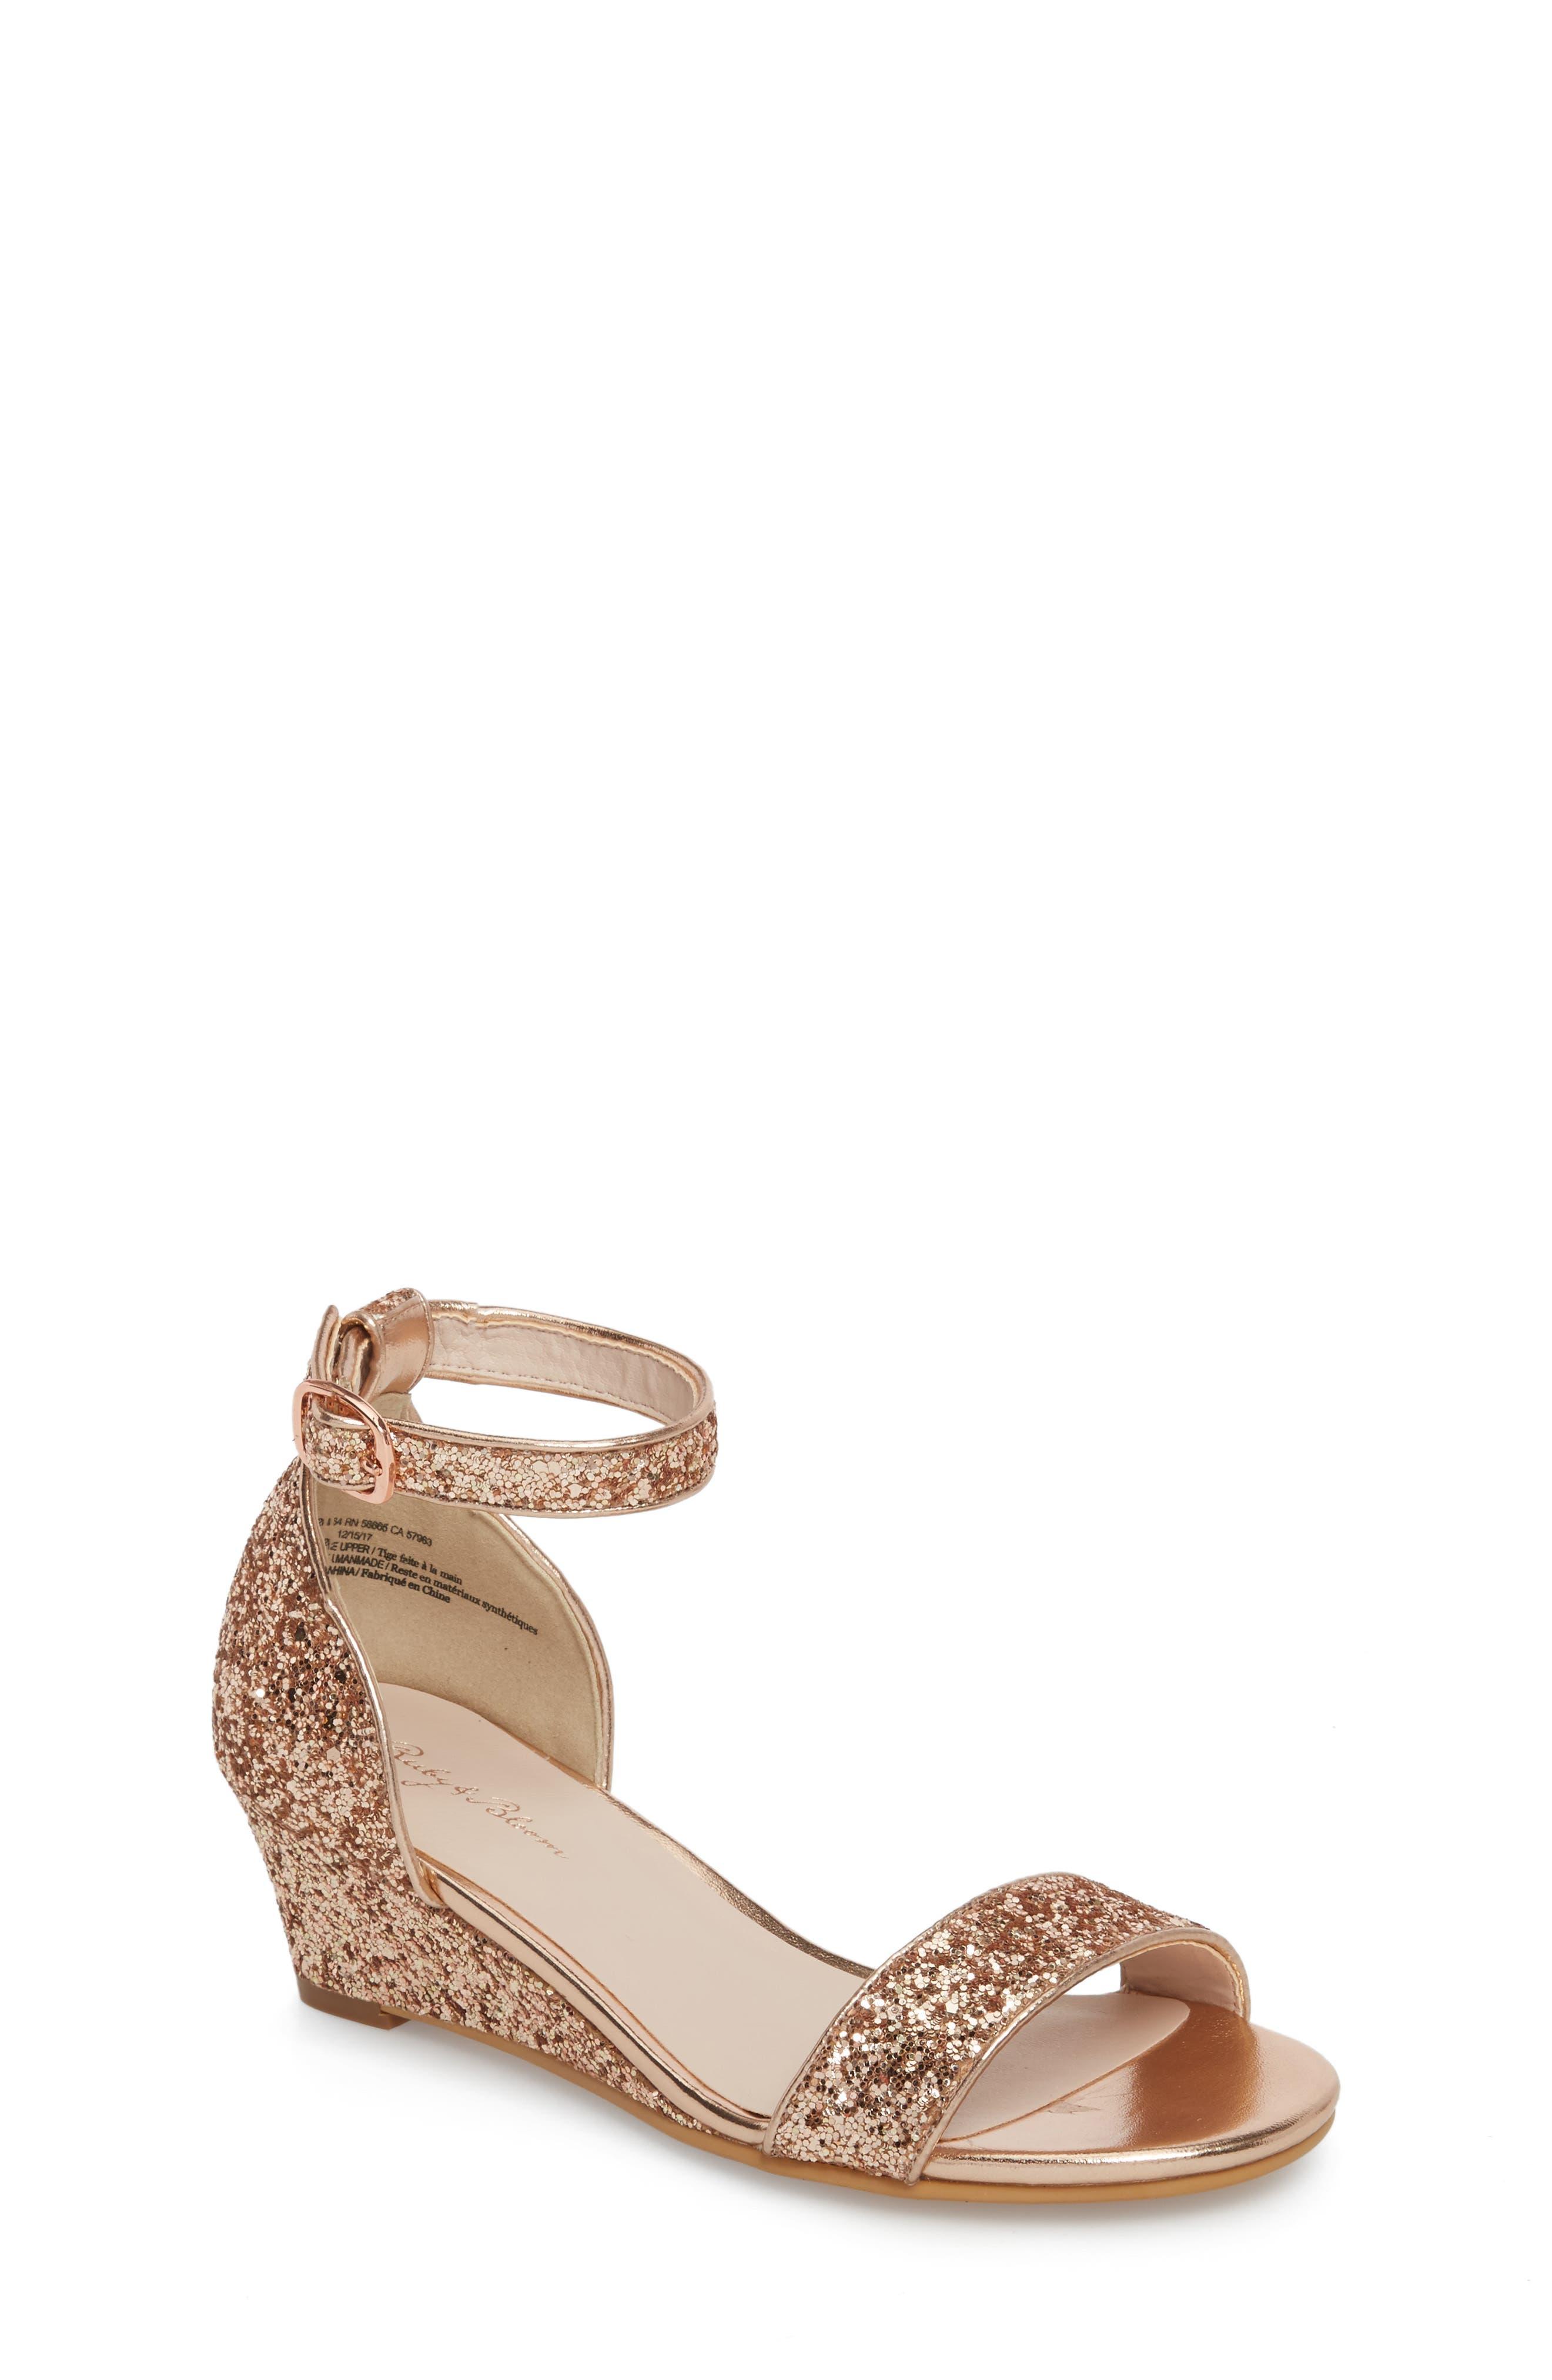 Remi Wedge Sandal,                         Main,                         color, Rose Gold Glitter